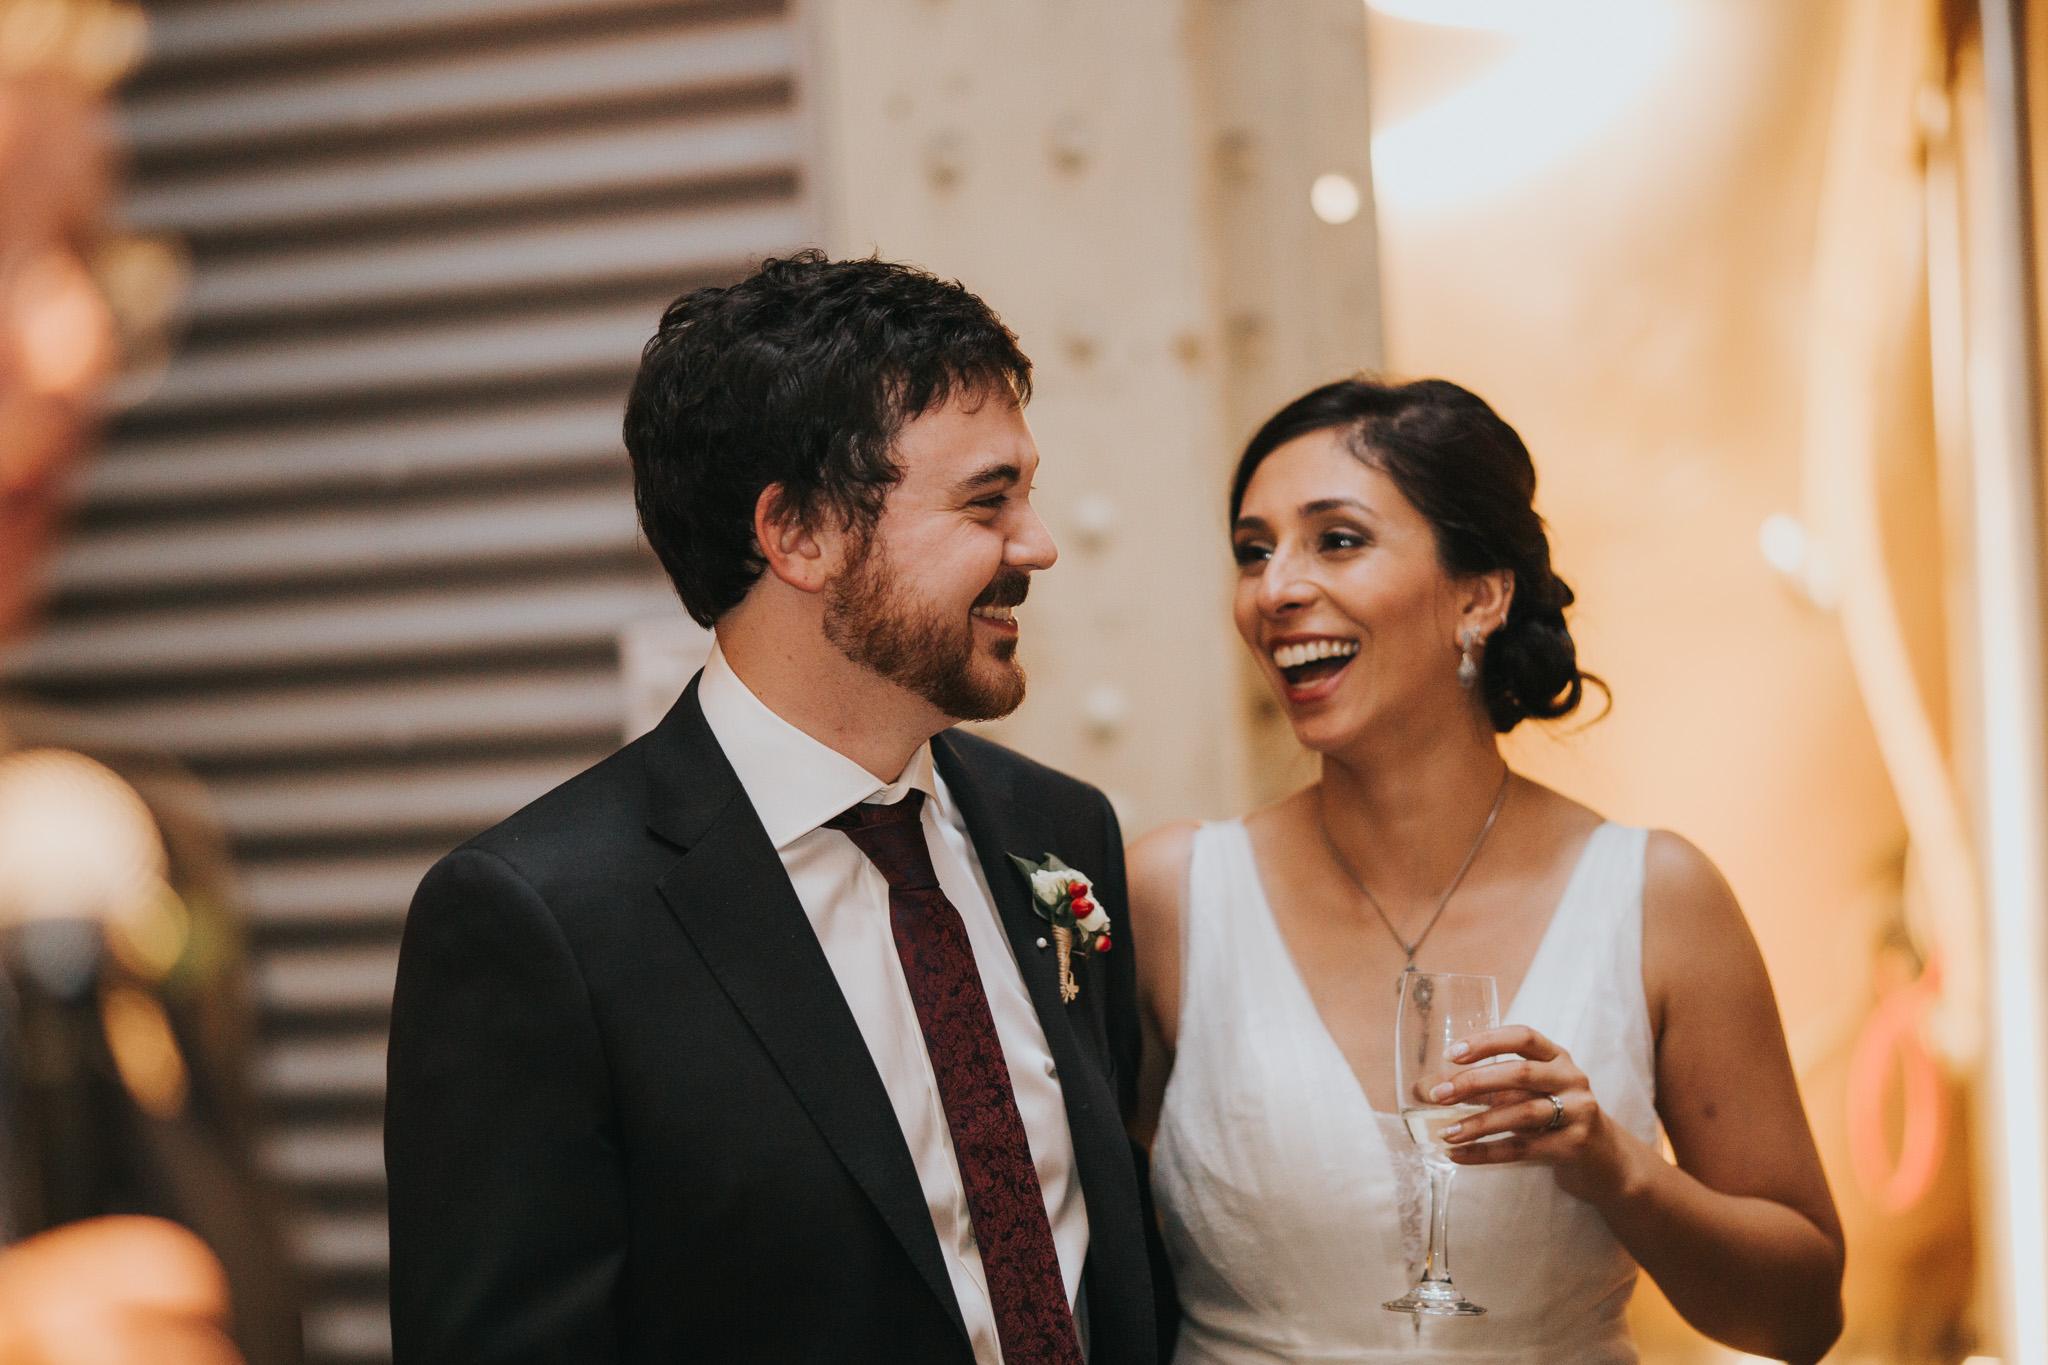 Wedding_webfile-600.jpg